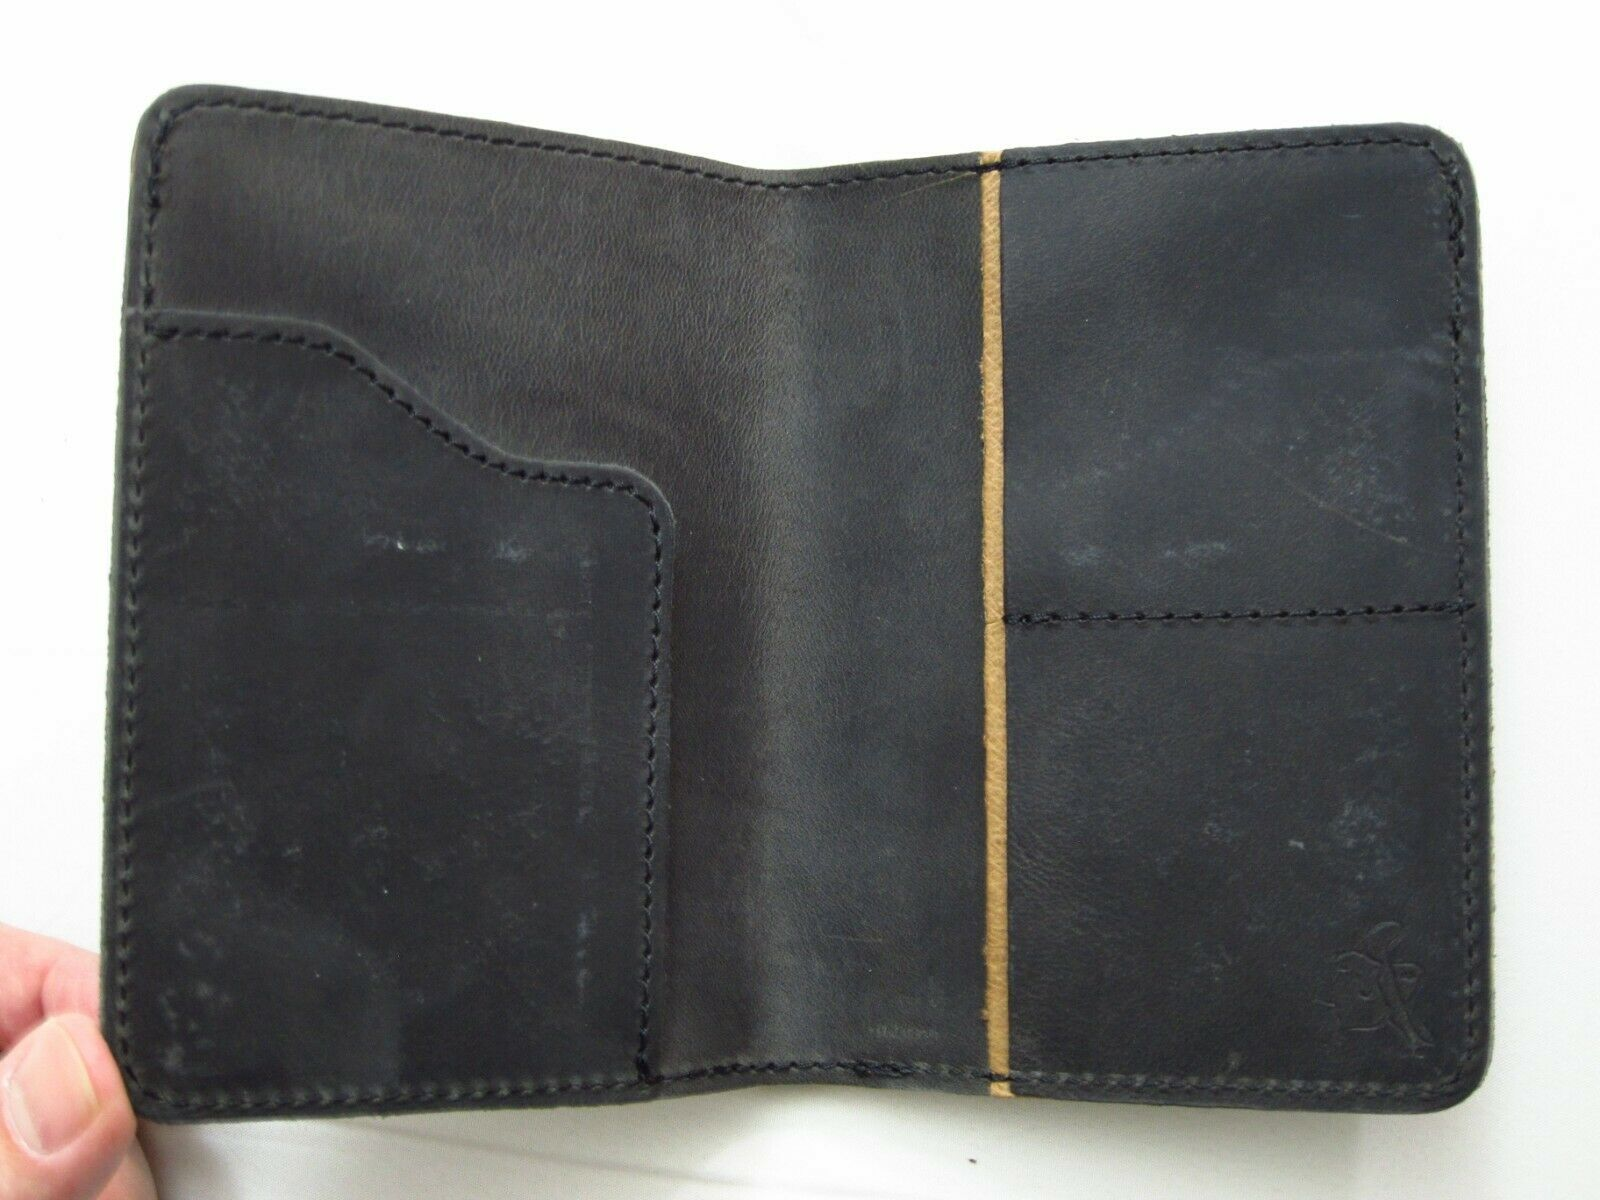 Saddleback Leather PASSPORT WALLET Dusty Carbon Black Script Logo